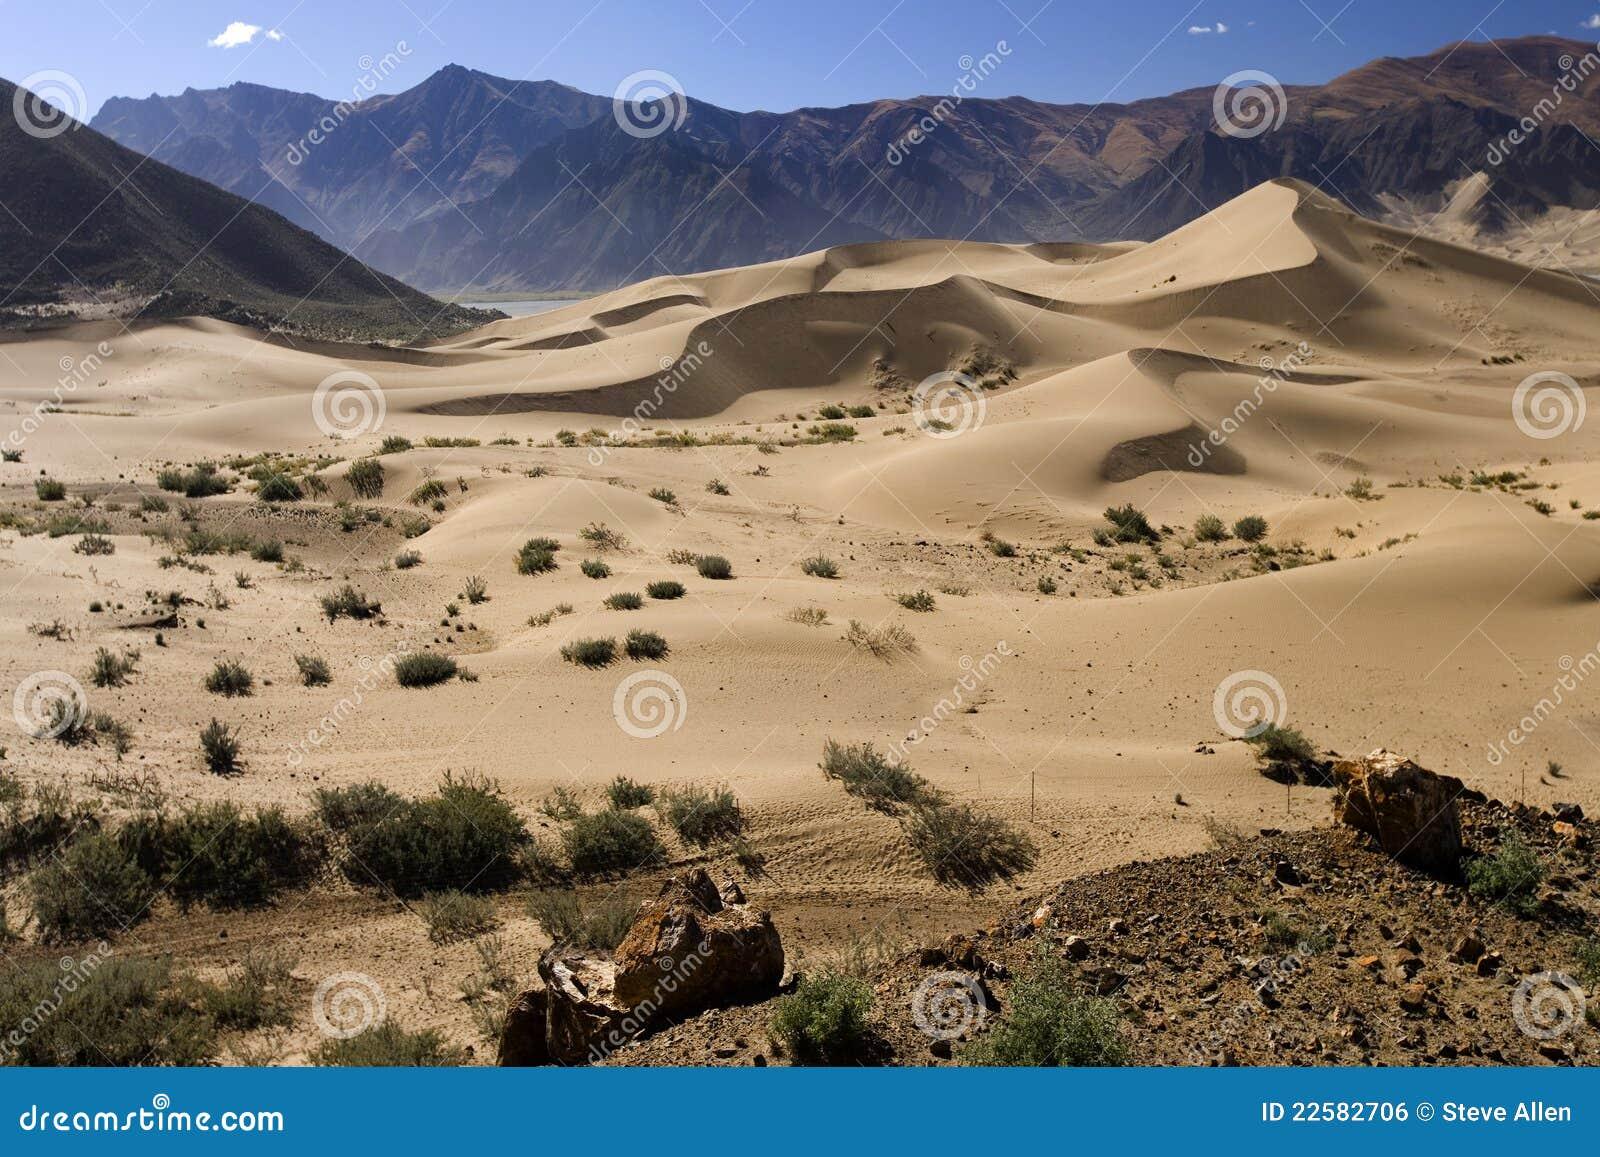 Sand dunes in the desert high on the Tibetan Plateau in the Tibet ...Western Desert Clipart